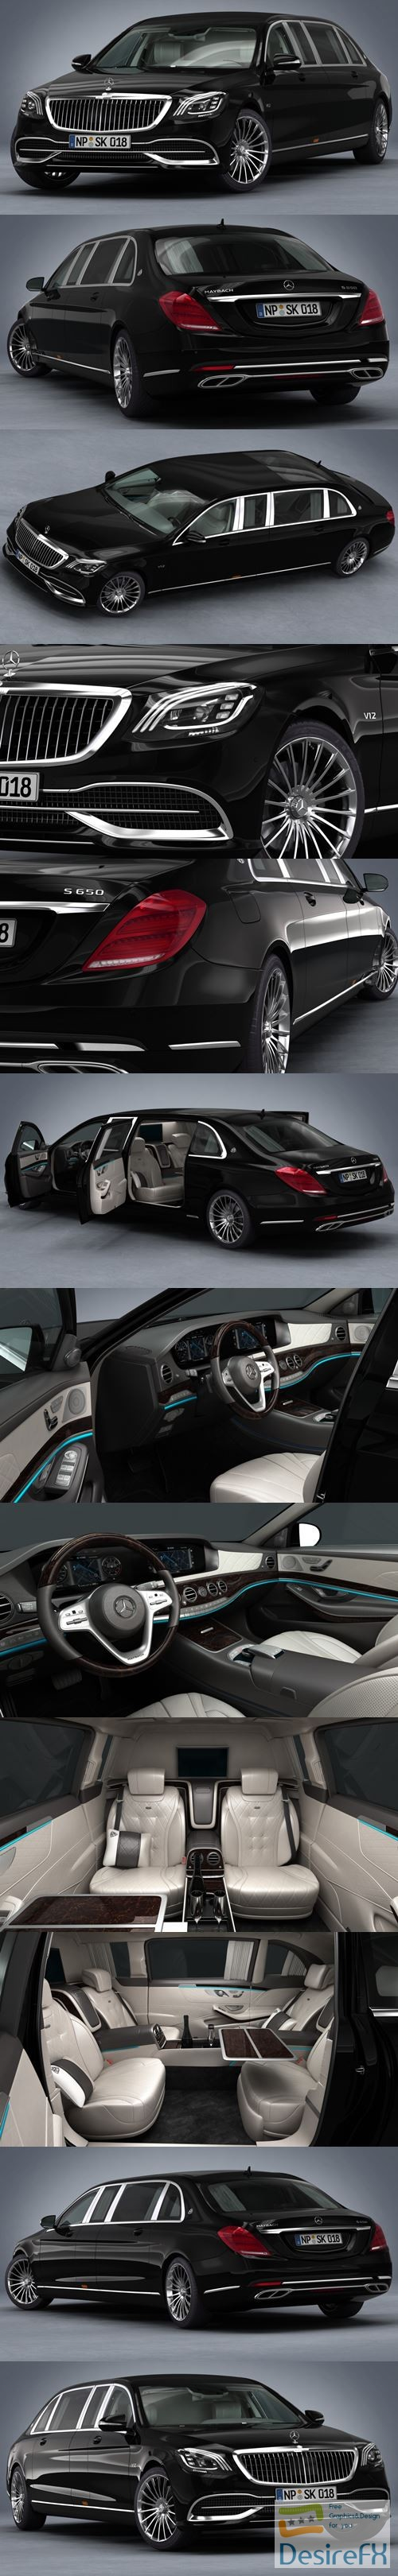 3d-models - Mercedes-Benz S650 Pullman Maybach 2019 3D Model